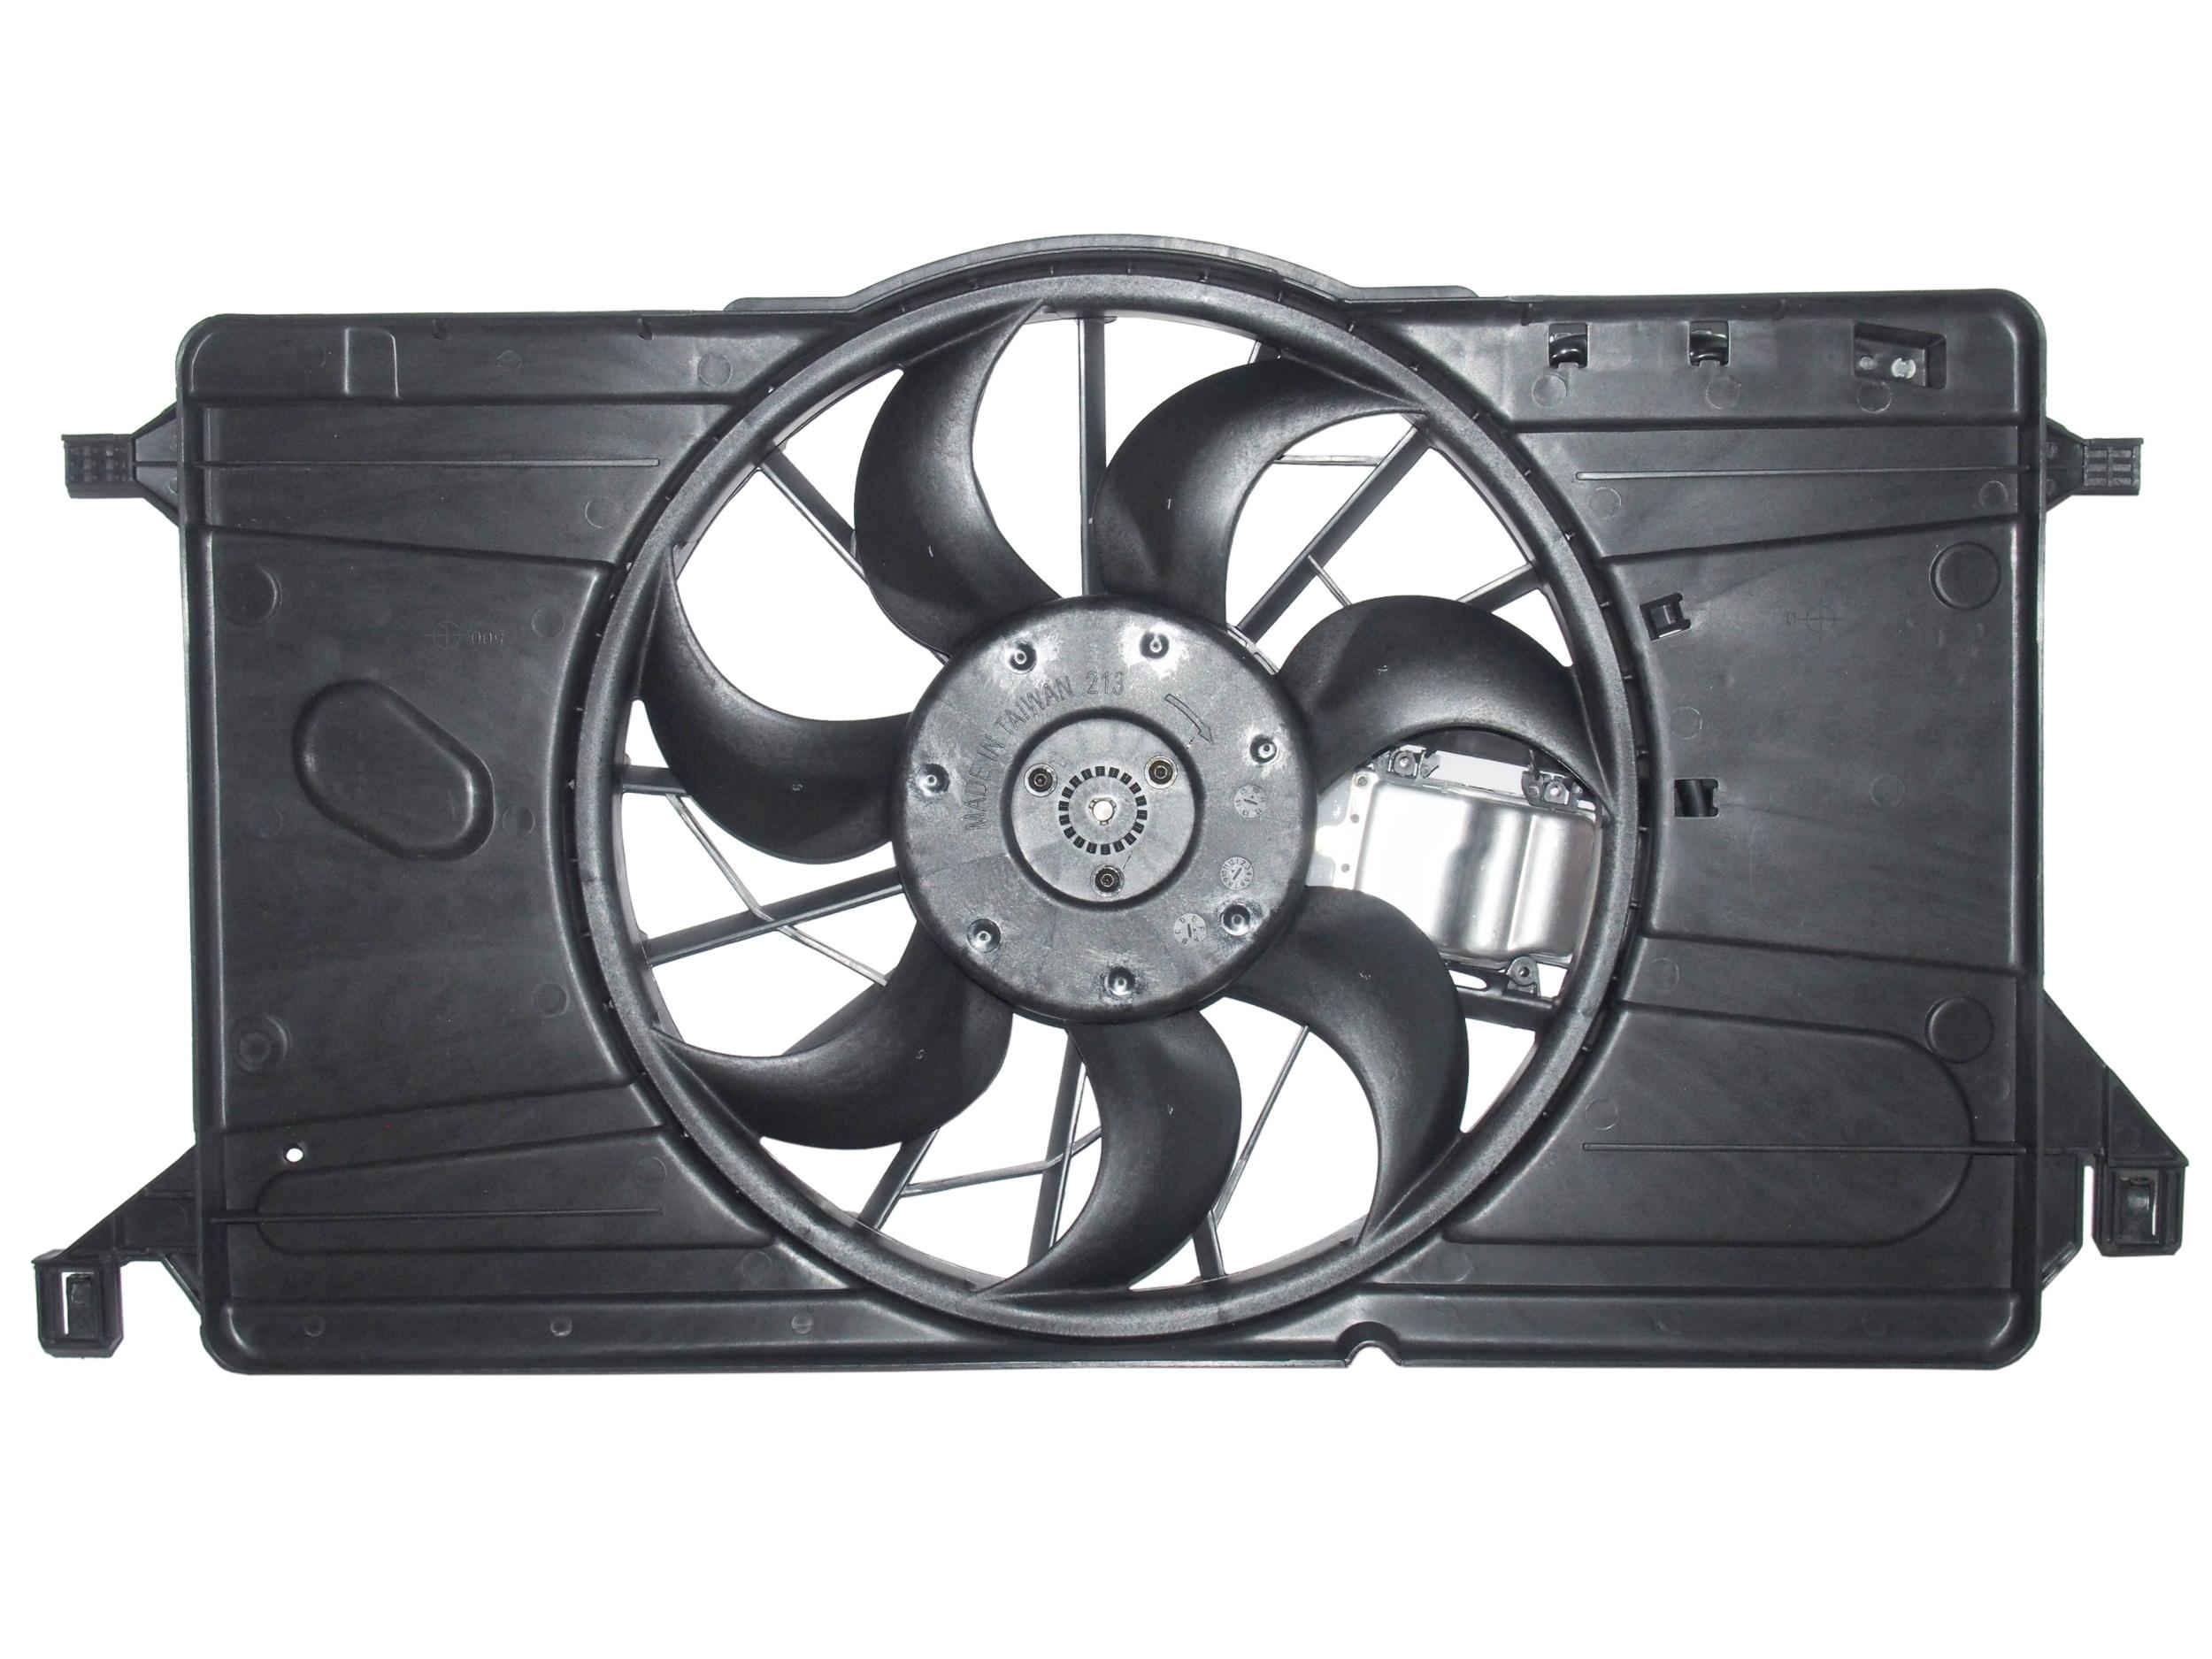 вентилятор радиатора volvo c30 c70 s40 v50 16 20